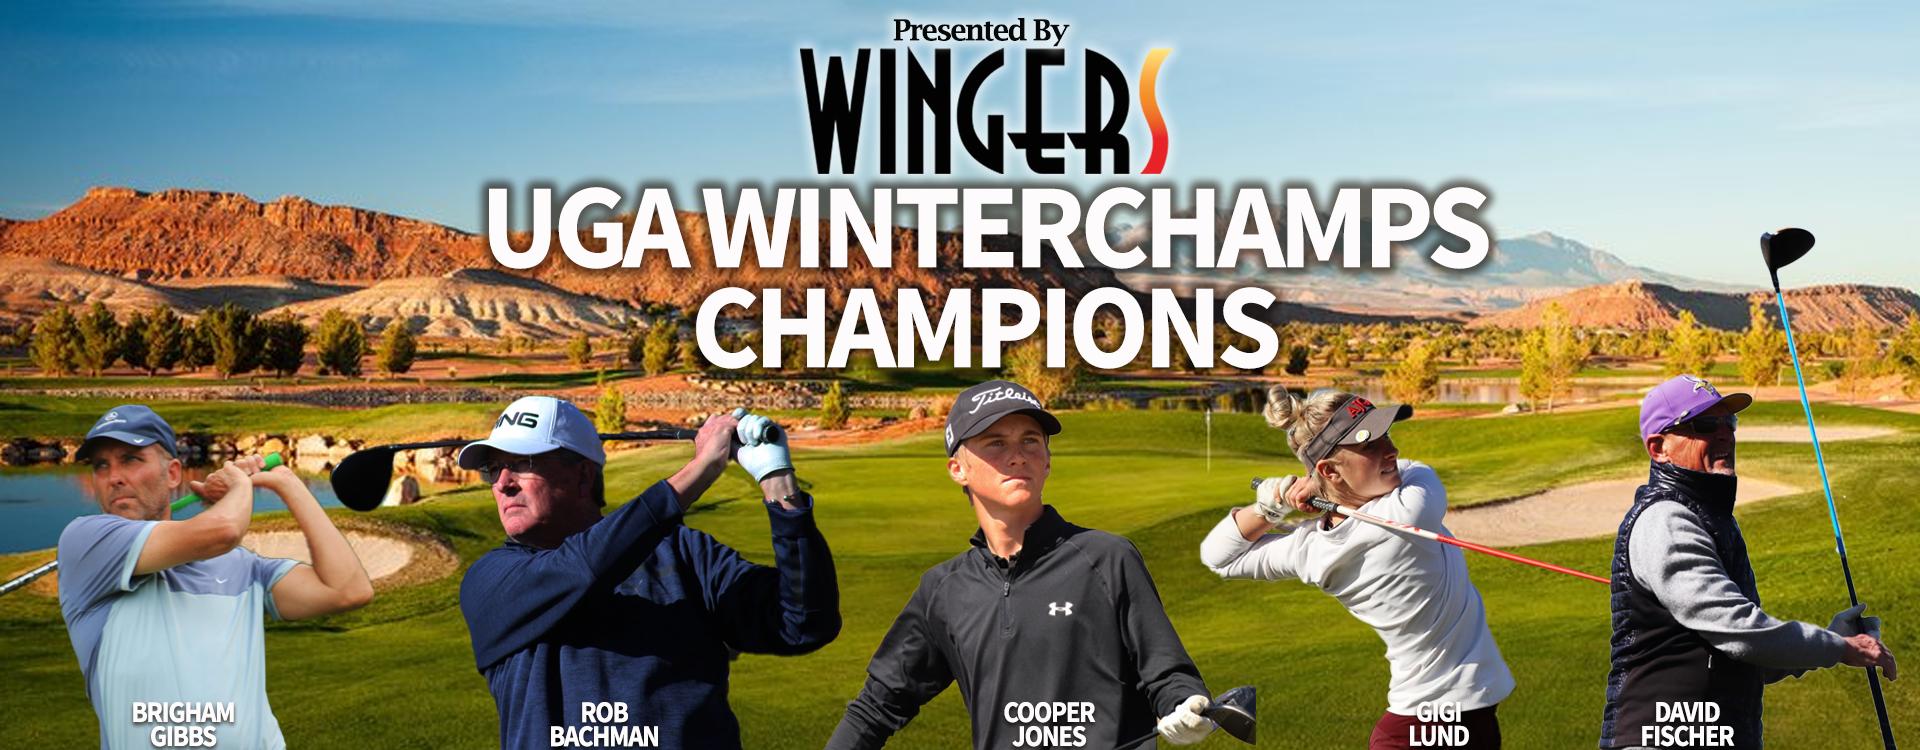 UGA-Winterchamps-Champions